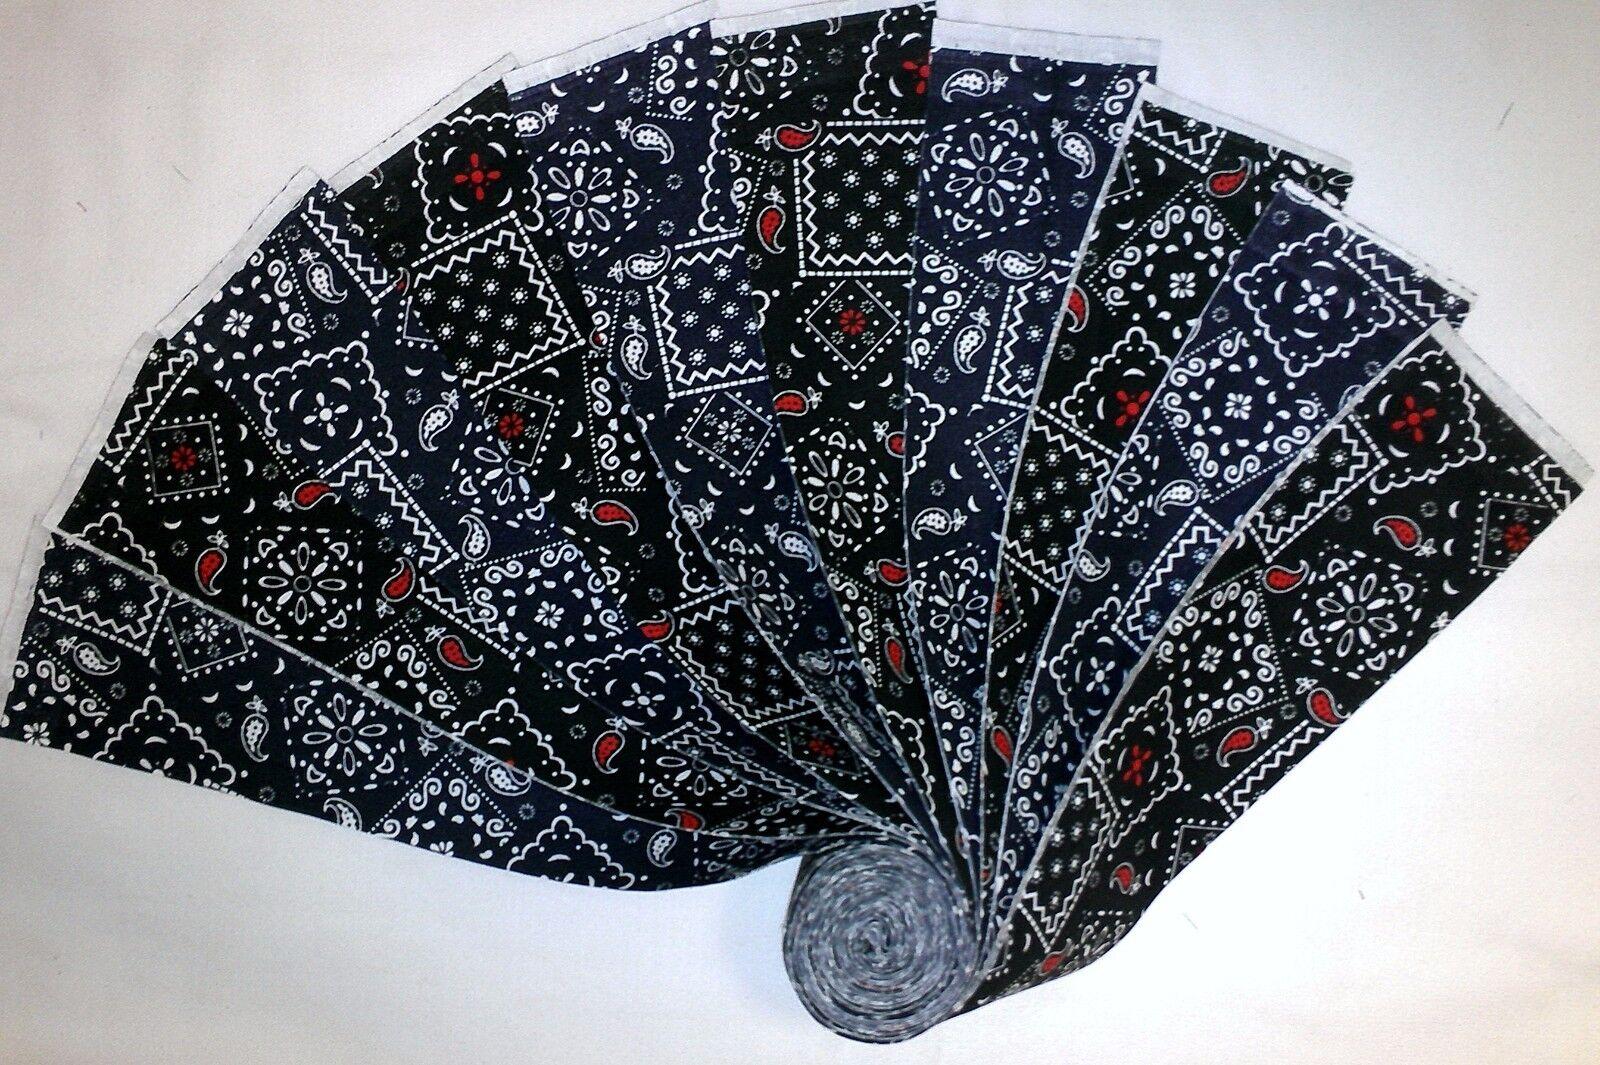 20 2.5 Quilting Fabric Jelly Roll Blazing Bandannas Black/Black Red Buy IWOF - $7.49